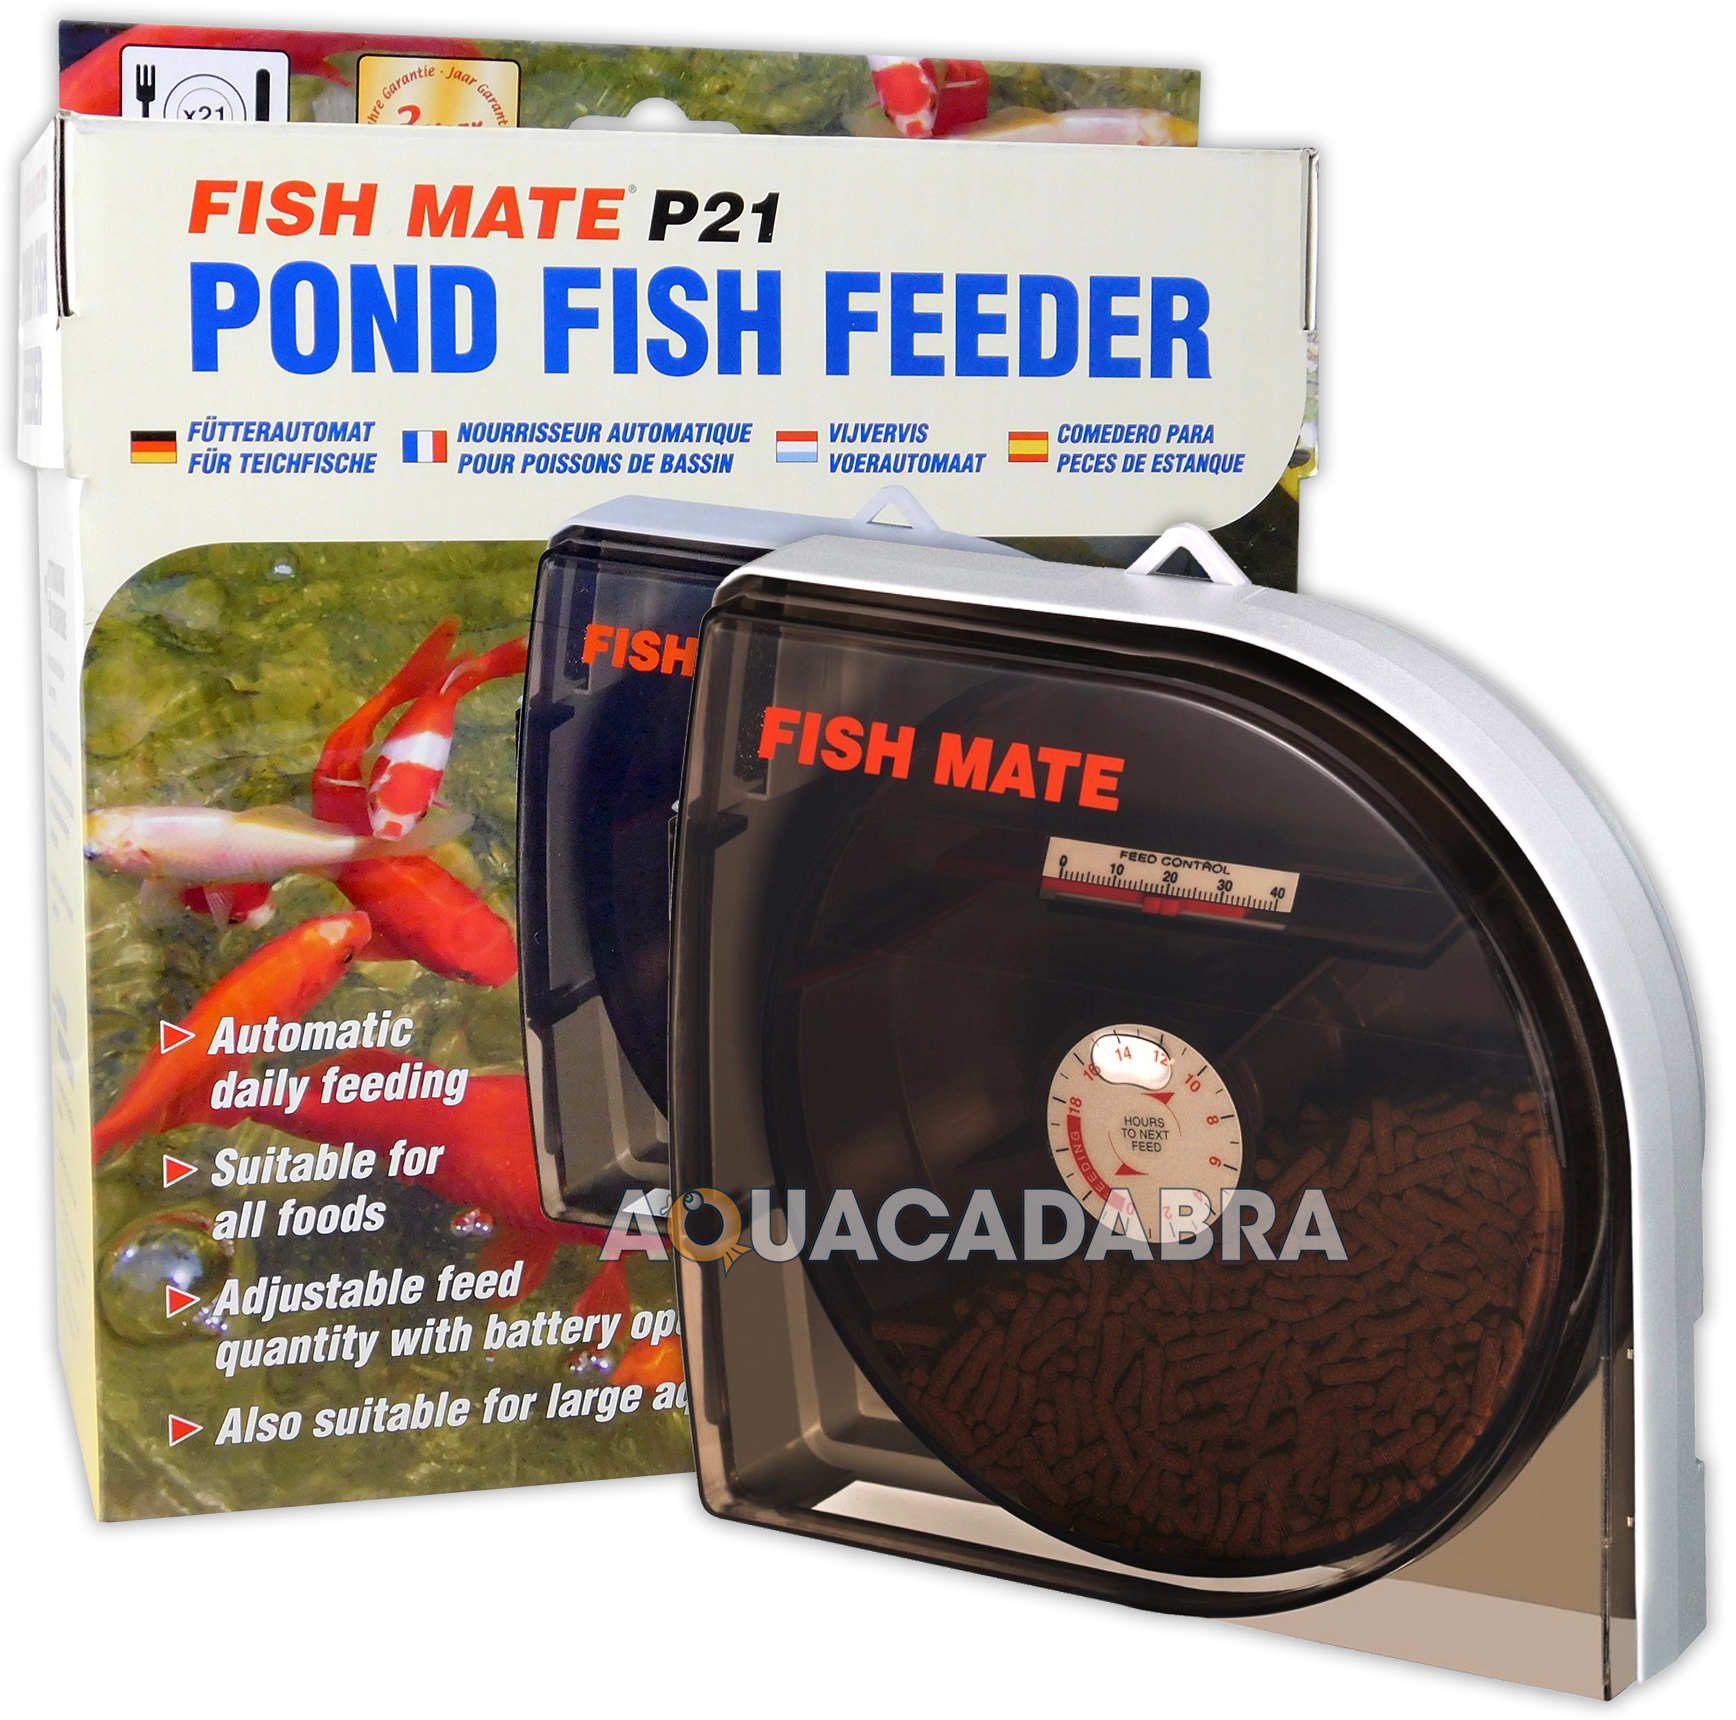 Fishmate P21 Pond Fish Mate Automatic Feeder Auto Holiday Feeding Food Timer Ebay